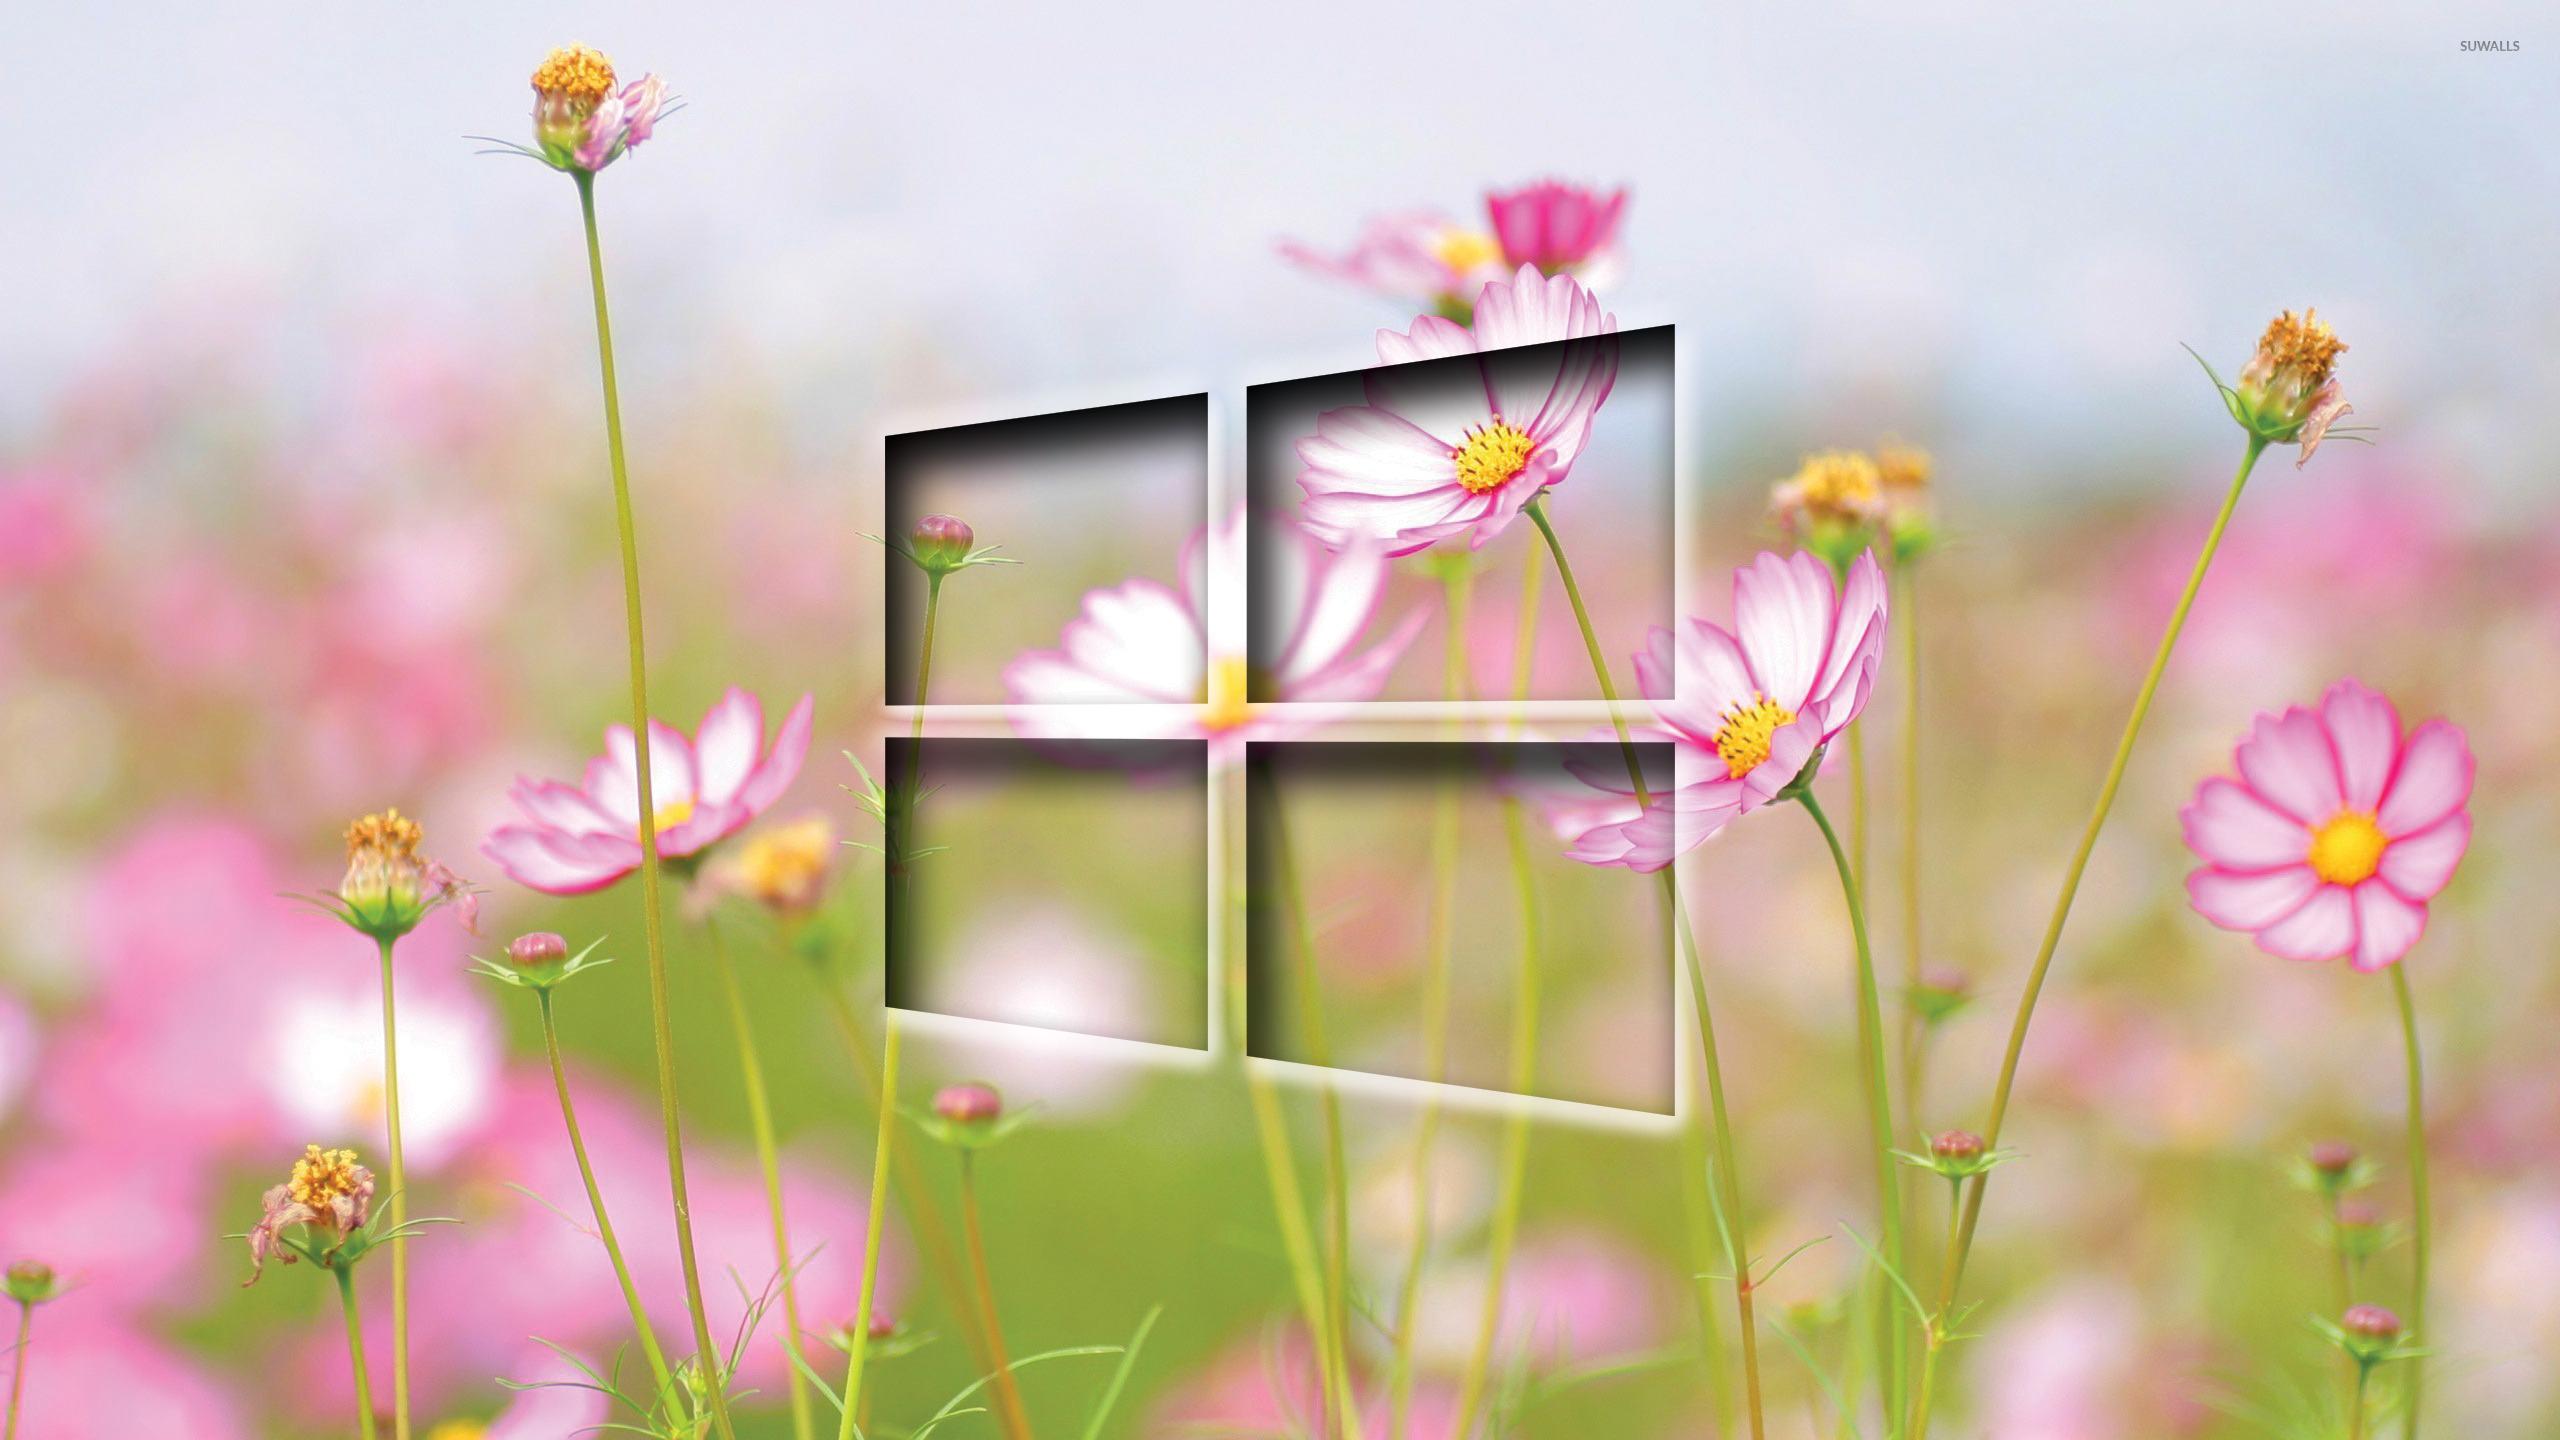 Windows 10 transparent logo on cosmos blossoms wallpaper 2560x1440 2560x1440